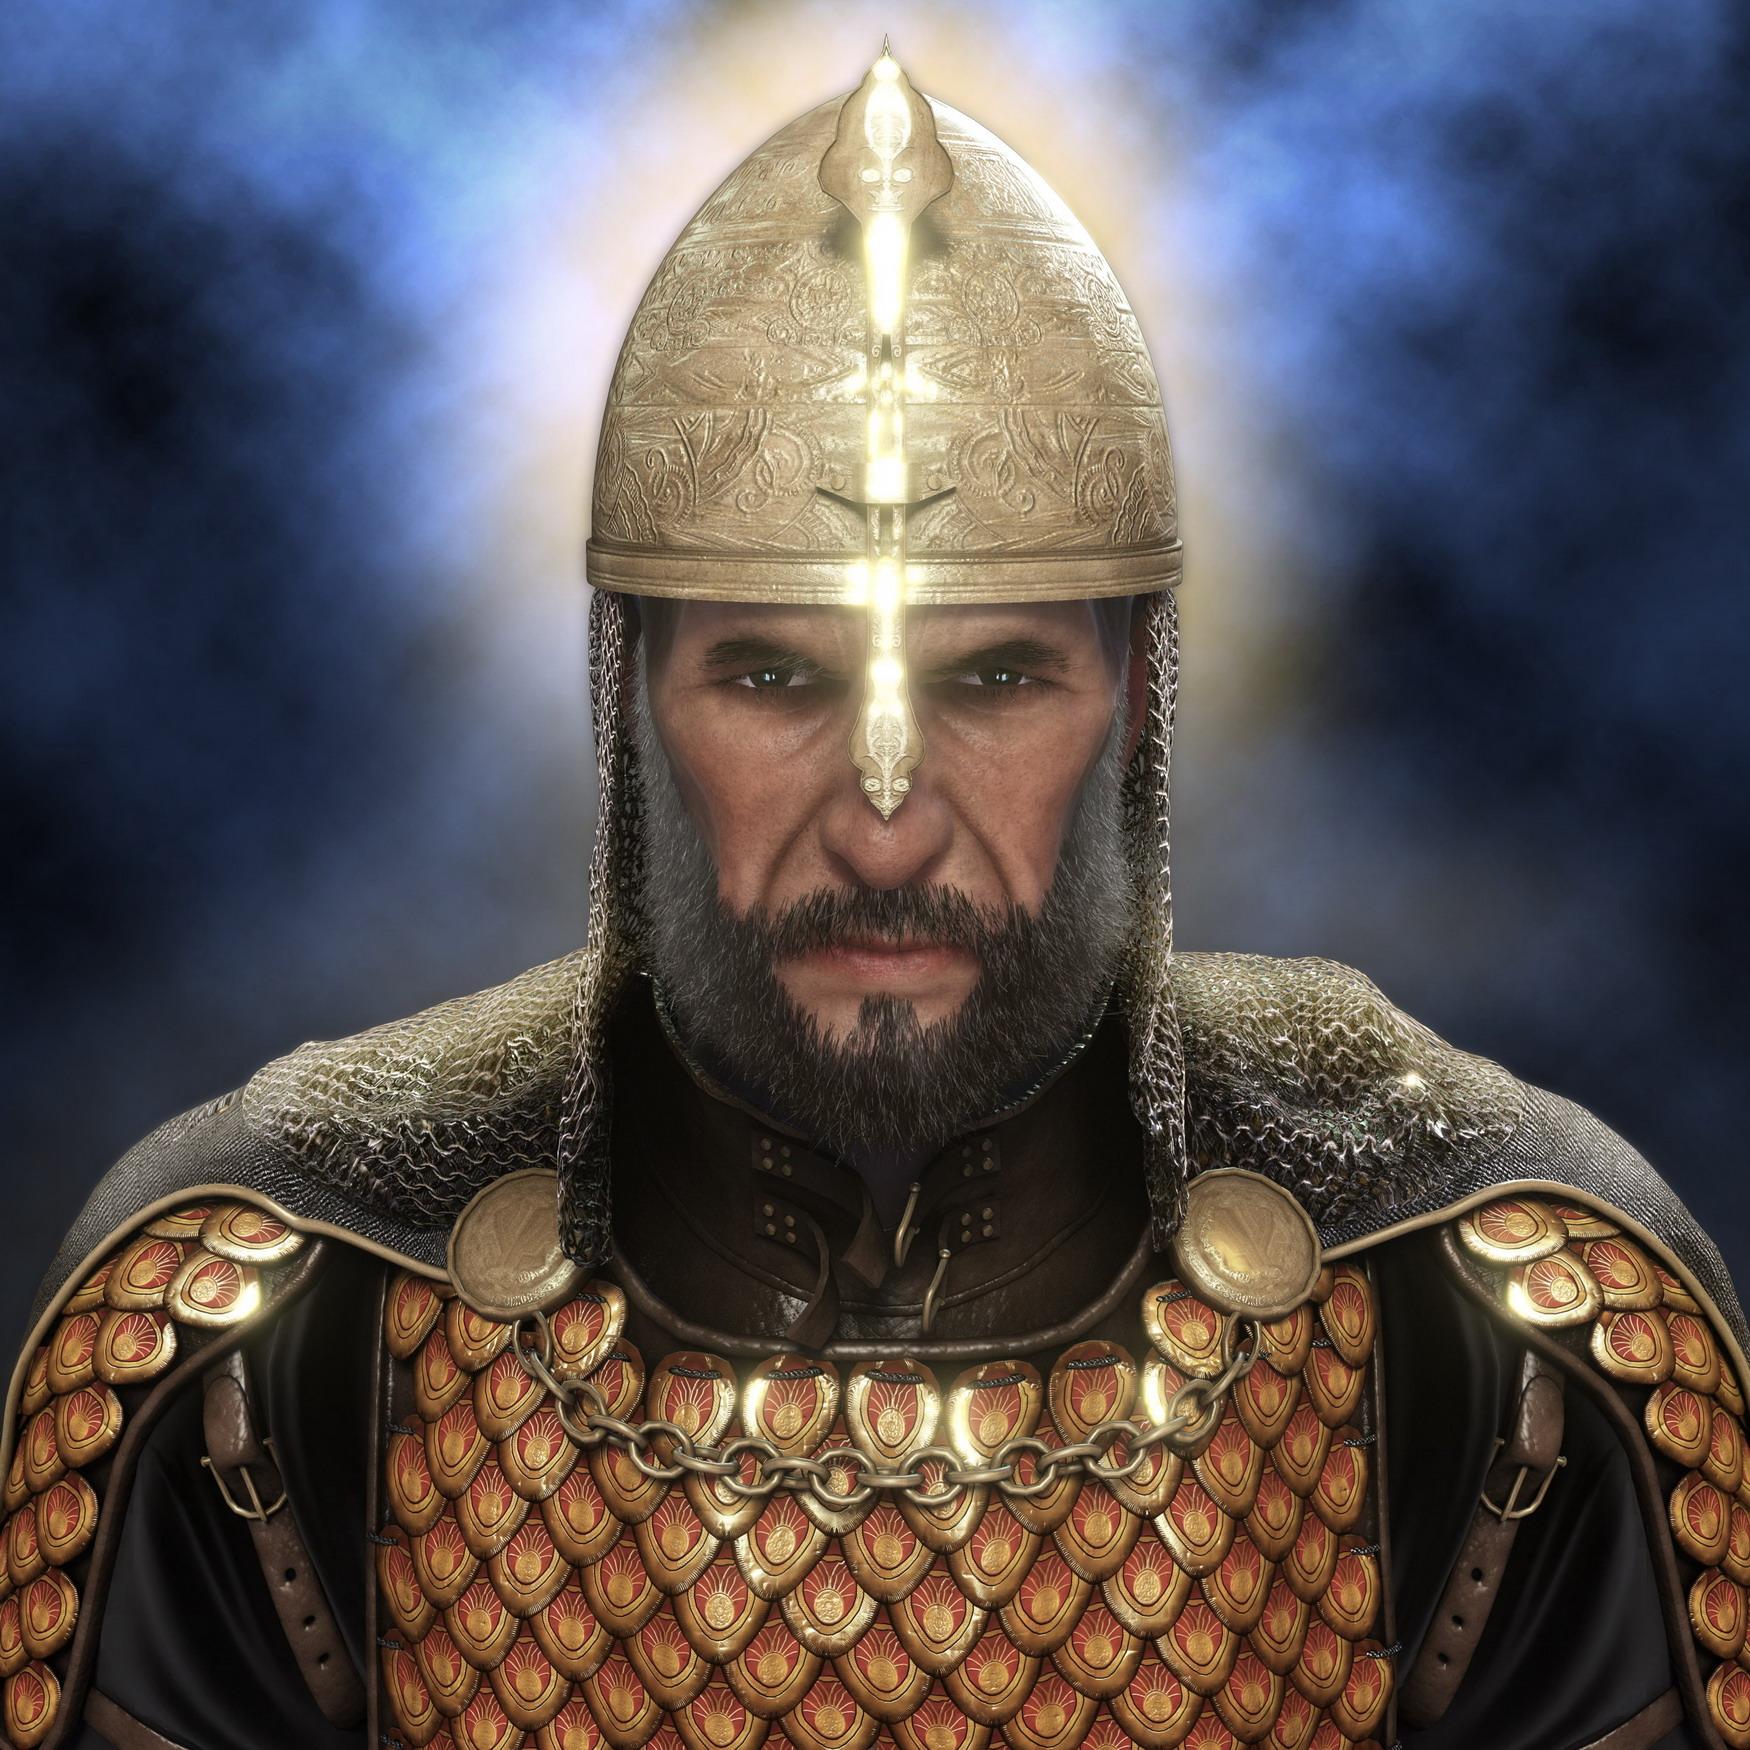 Saladin | Total War Wiki | FANDOM powered by Wikia | 1750 x 1750 jpeg 771kB